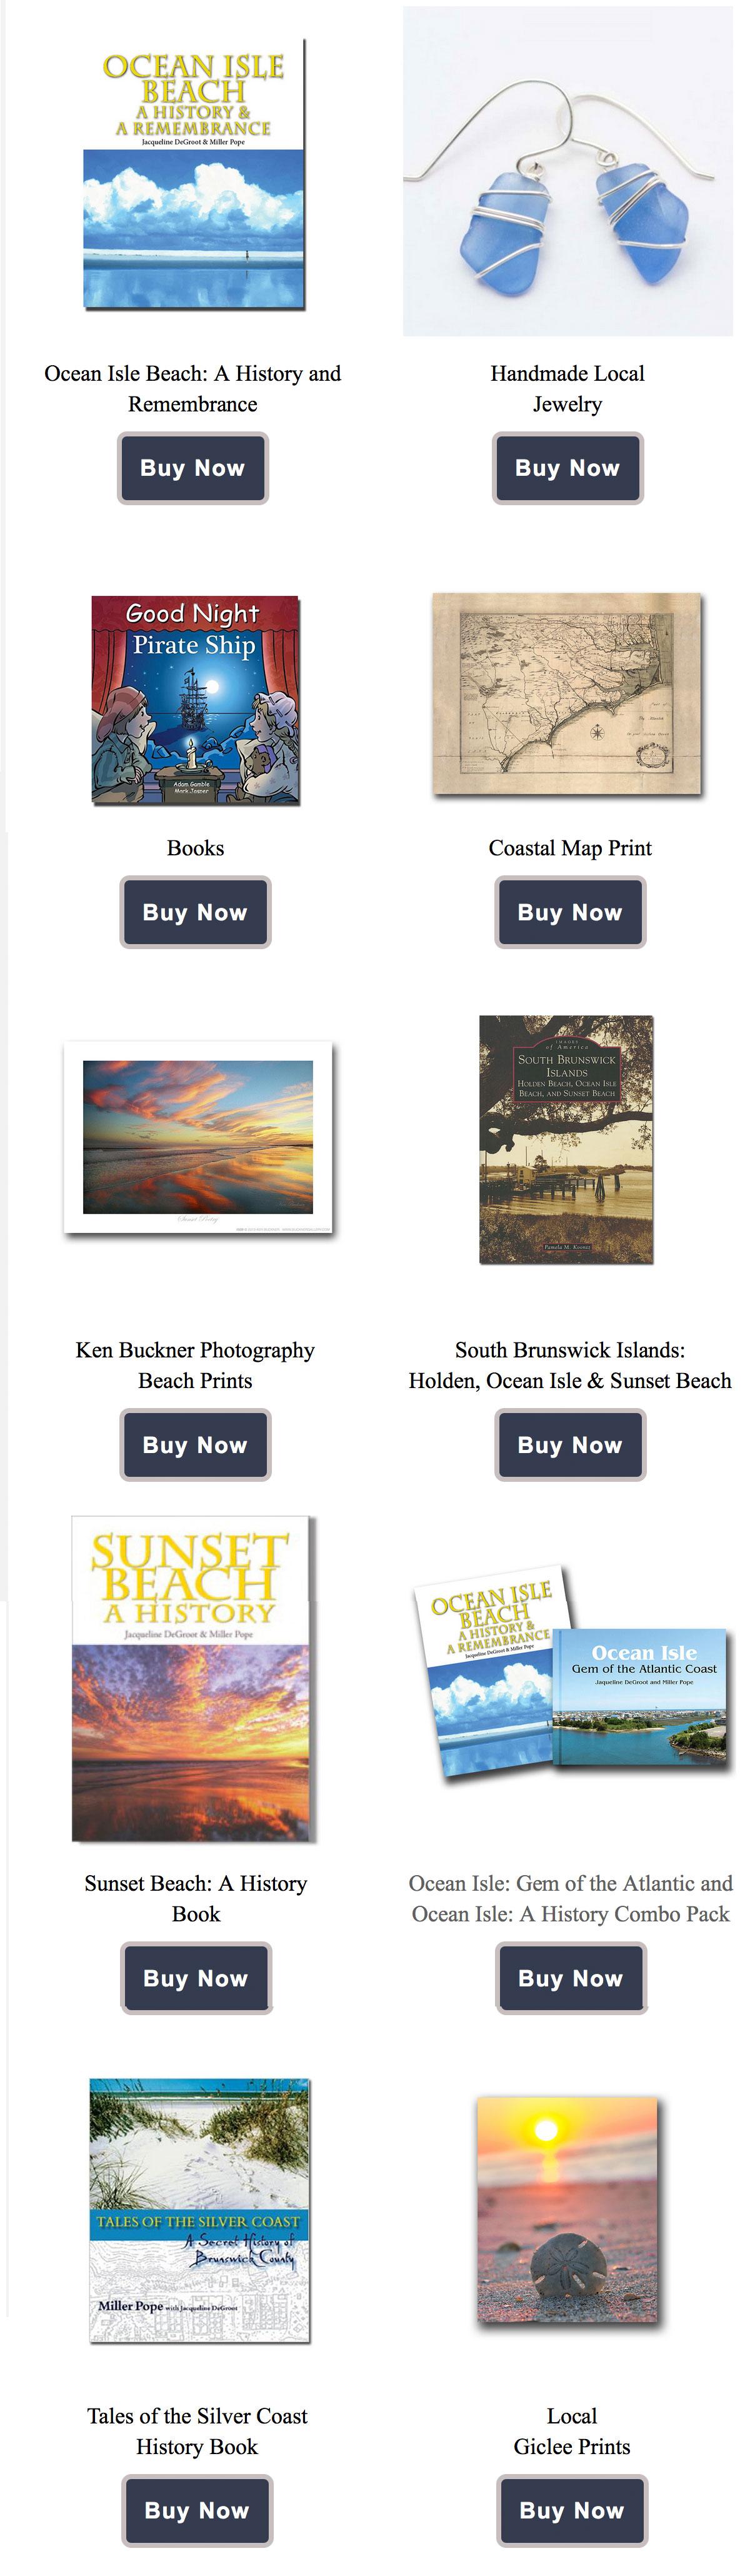 ISLANDS-ART local art, books and jewlery from the artists of Coastal Carolina